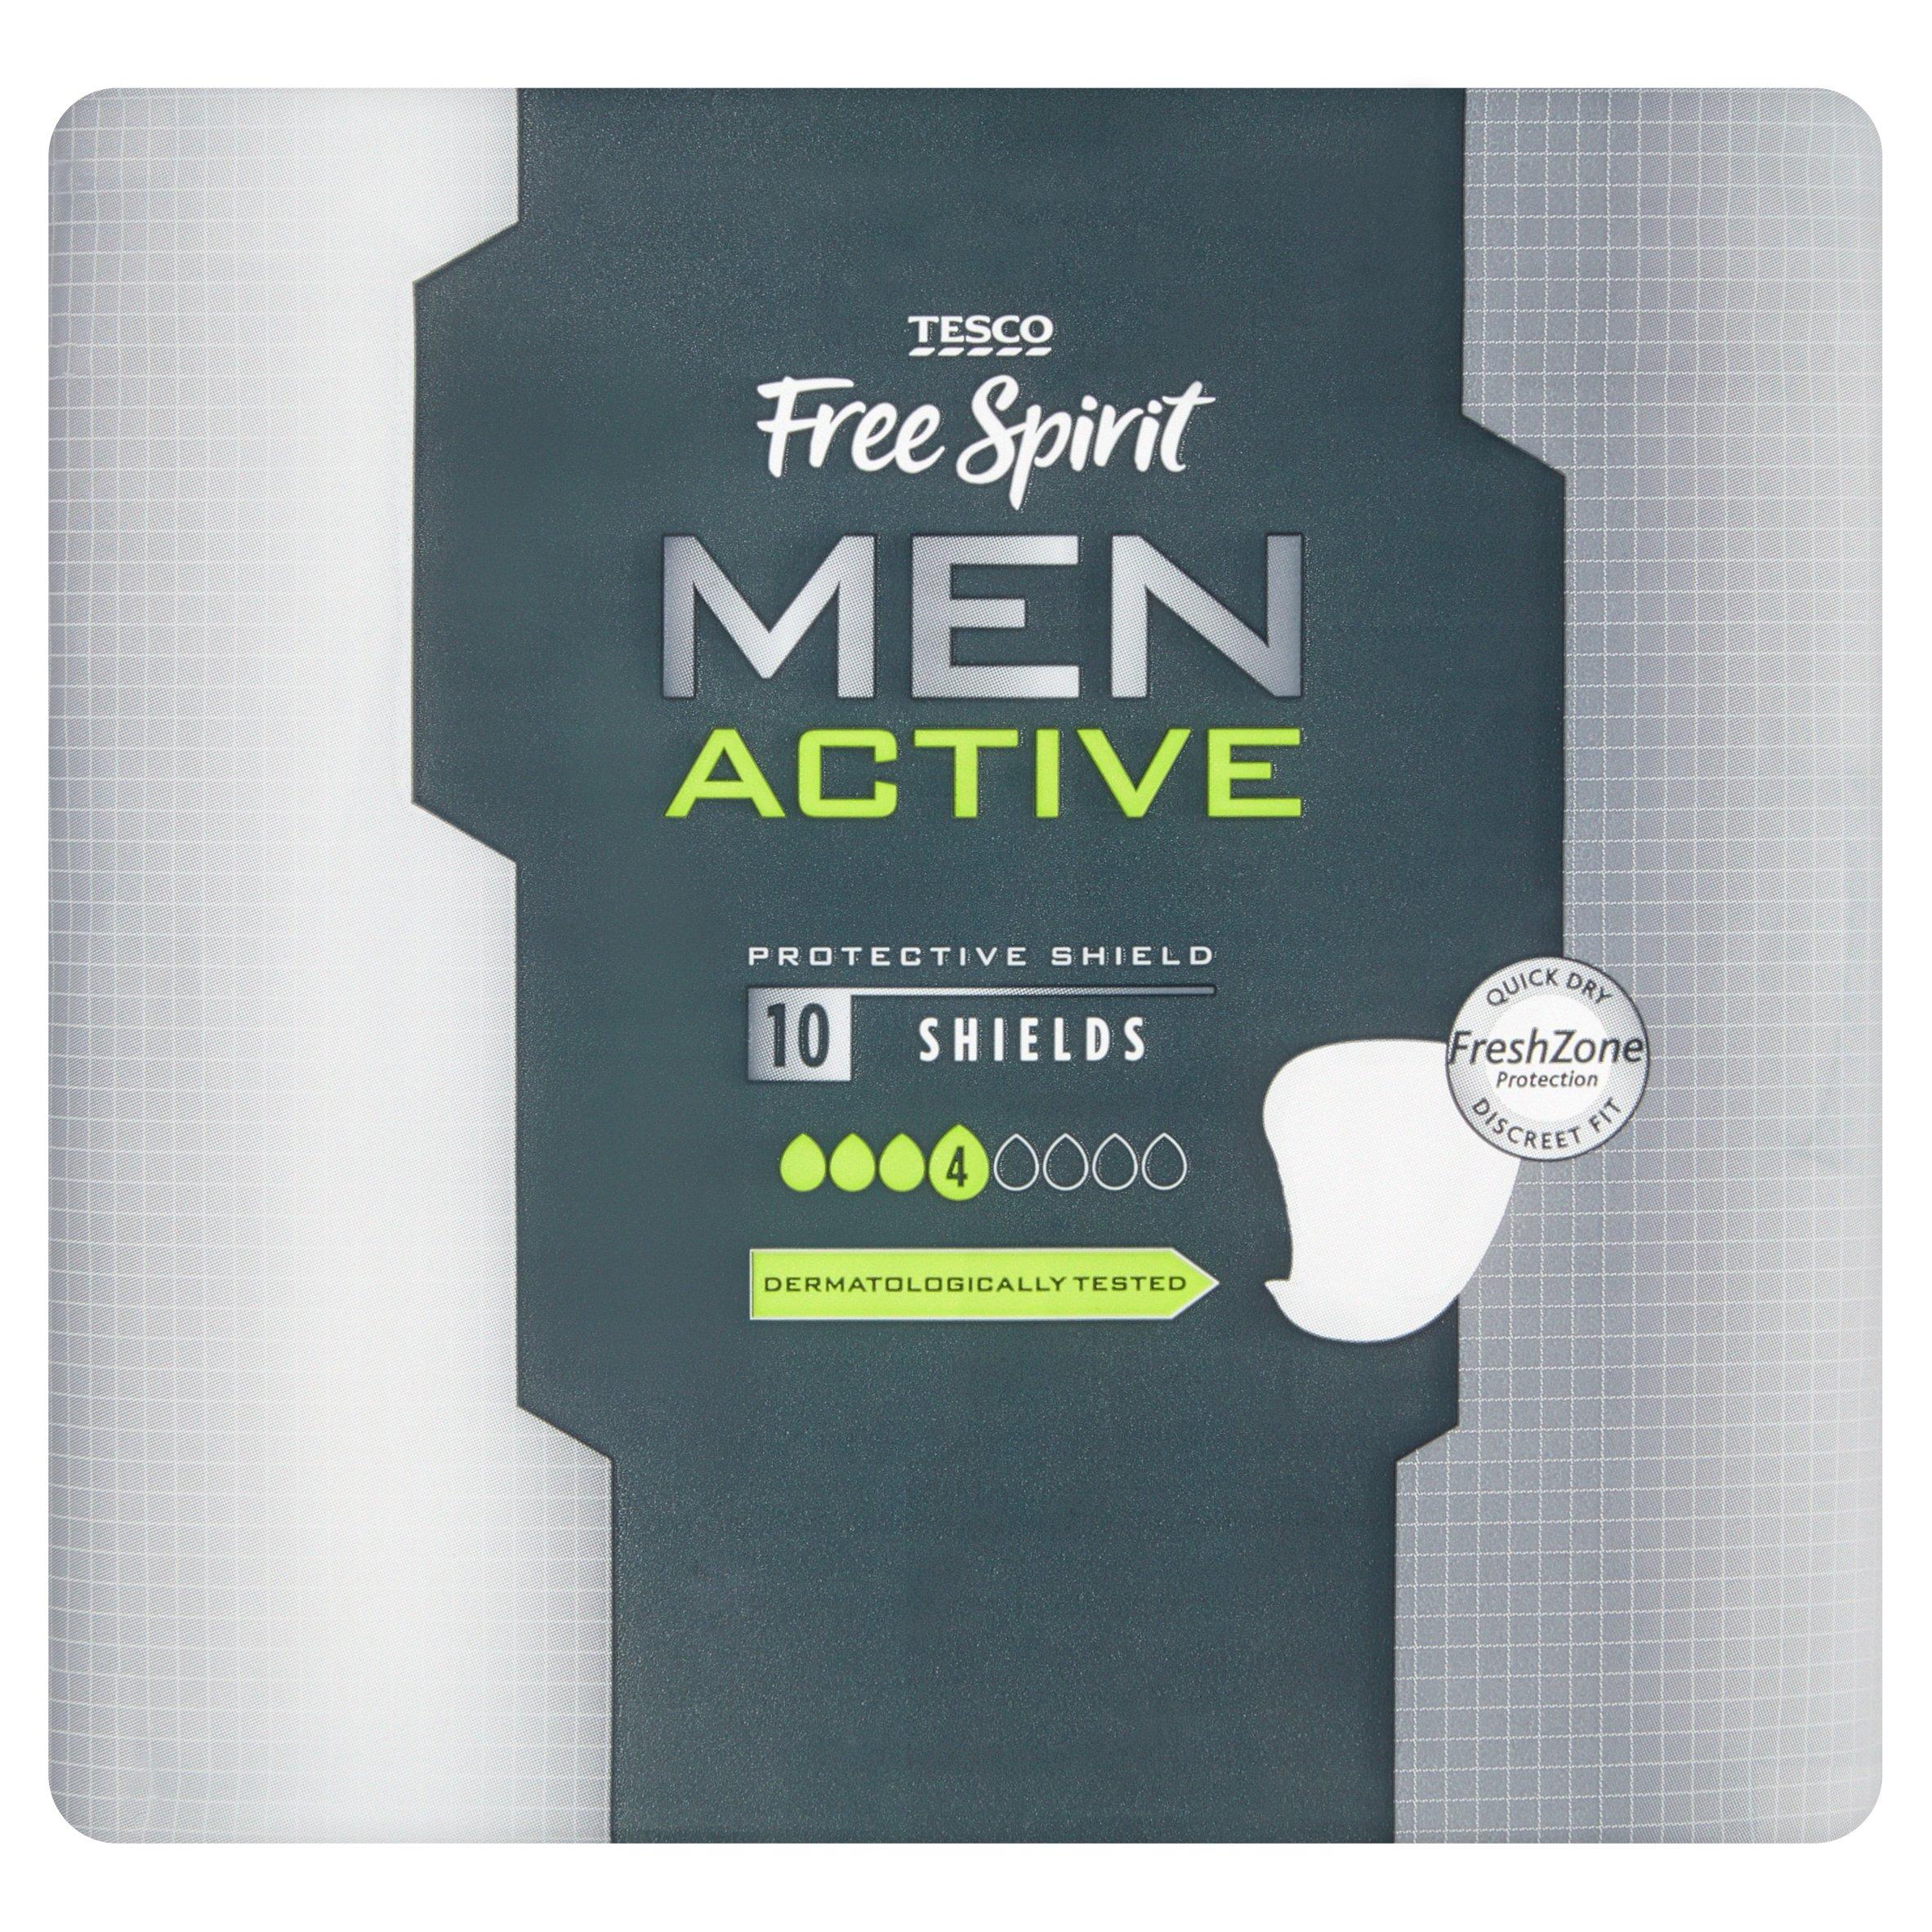 Tesco Free Spirit Men Active Shields 10